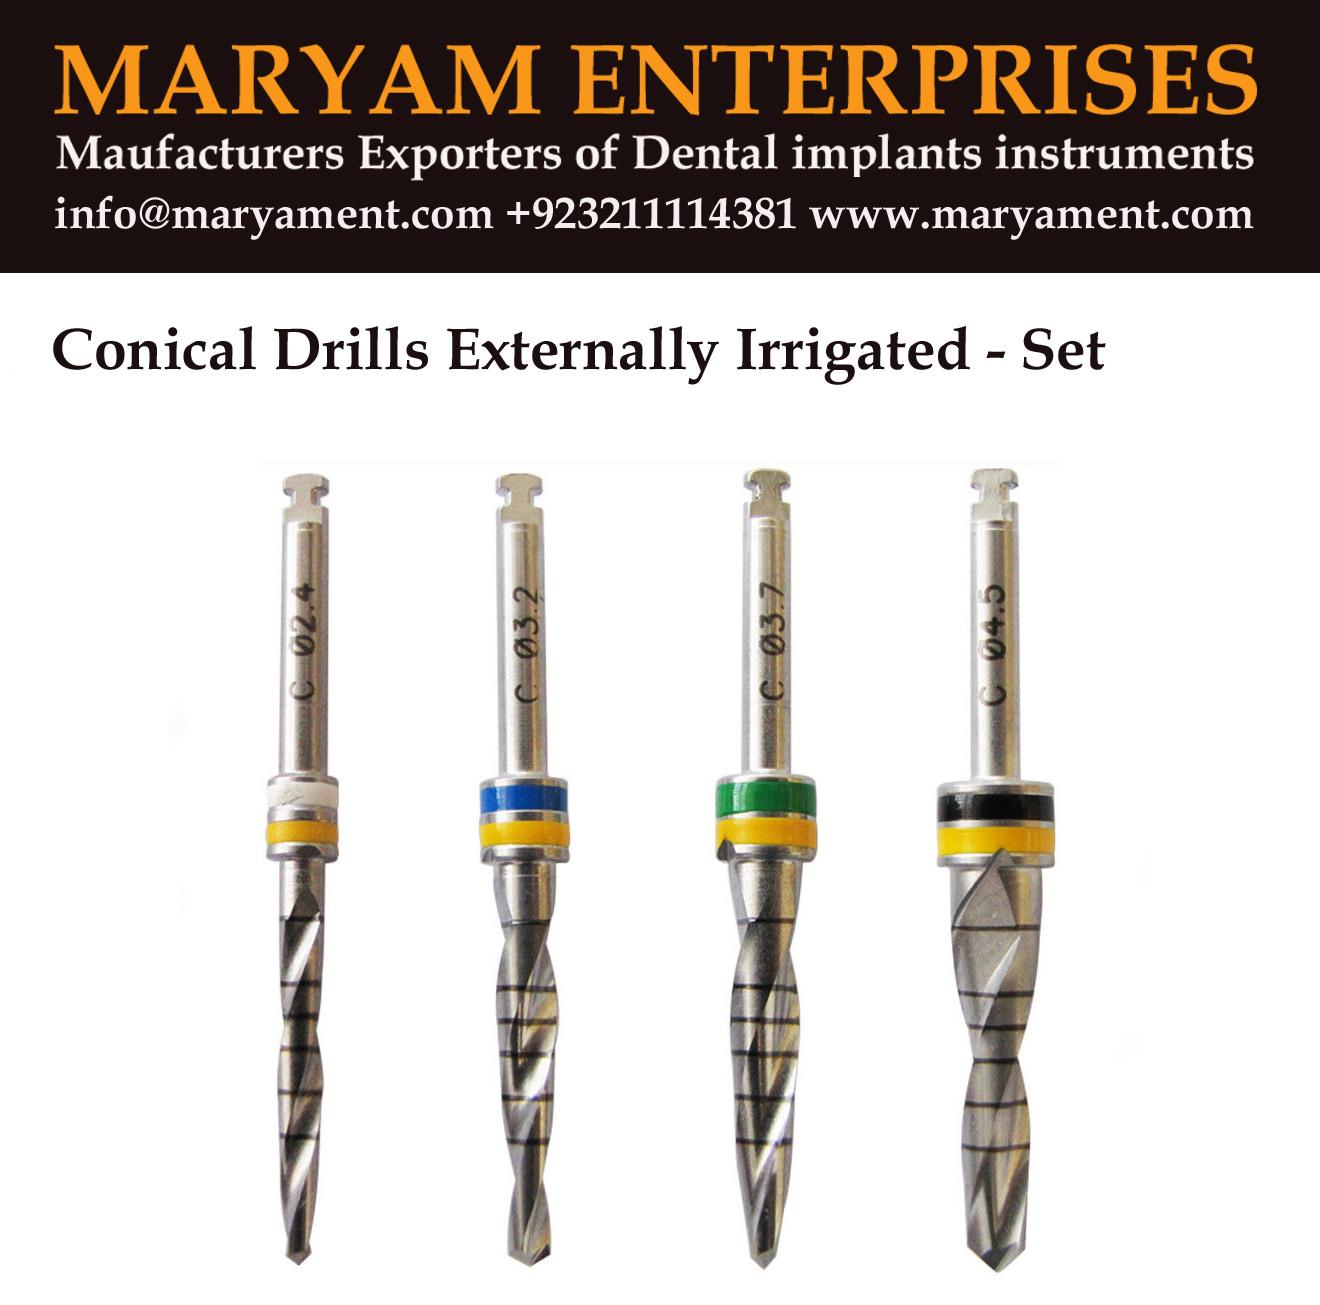 Dental implant drills Externally irrigated Maryam enterprises